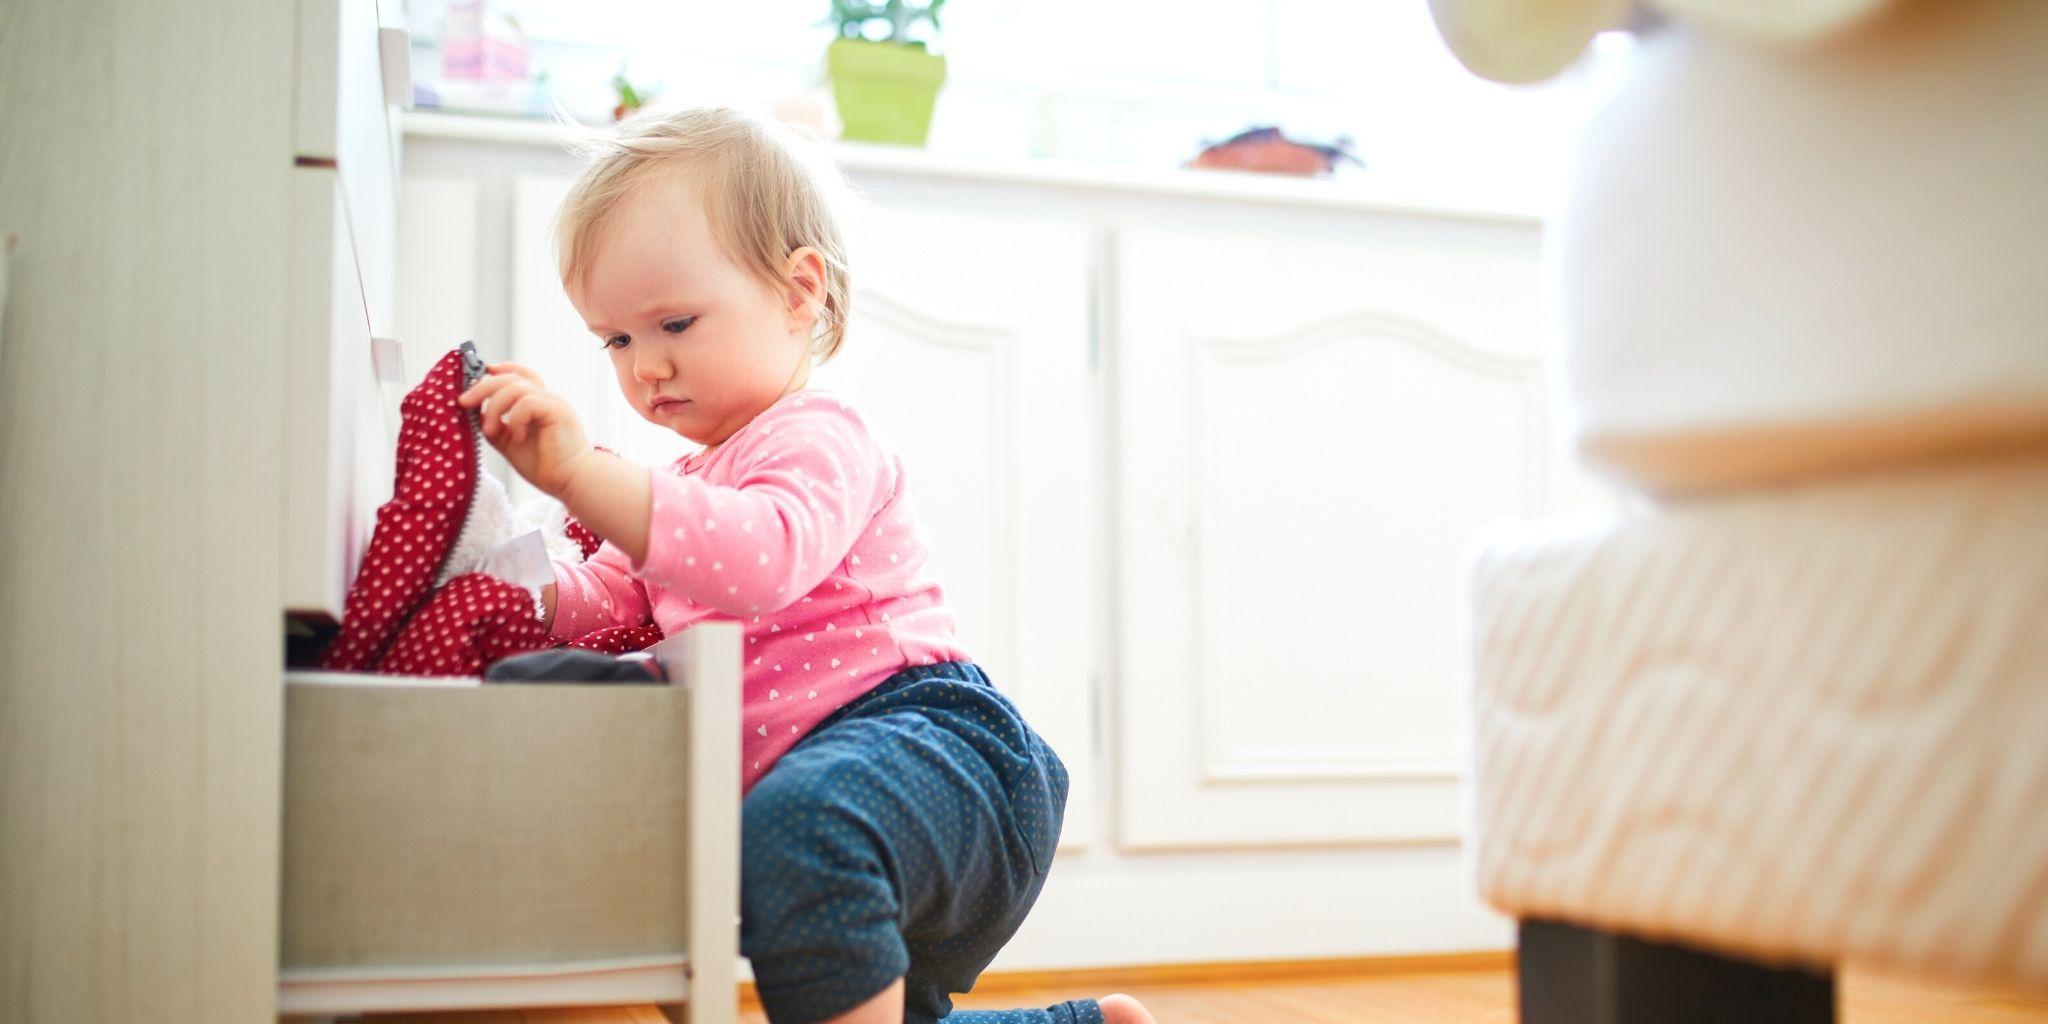 Hoe veilig is mijn huis: 5 kinderveiligheids-hacks die elke ouder moet kennen